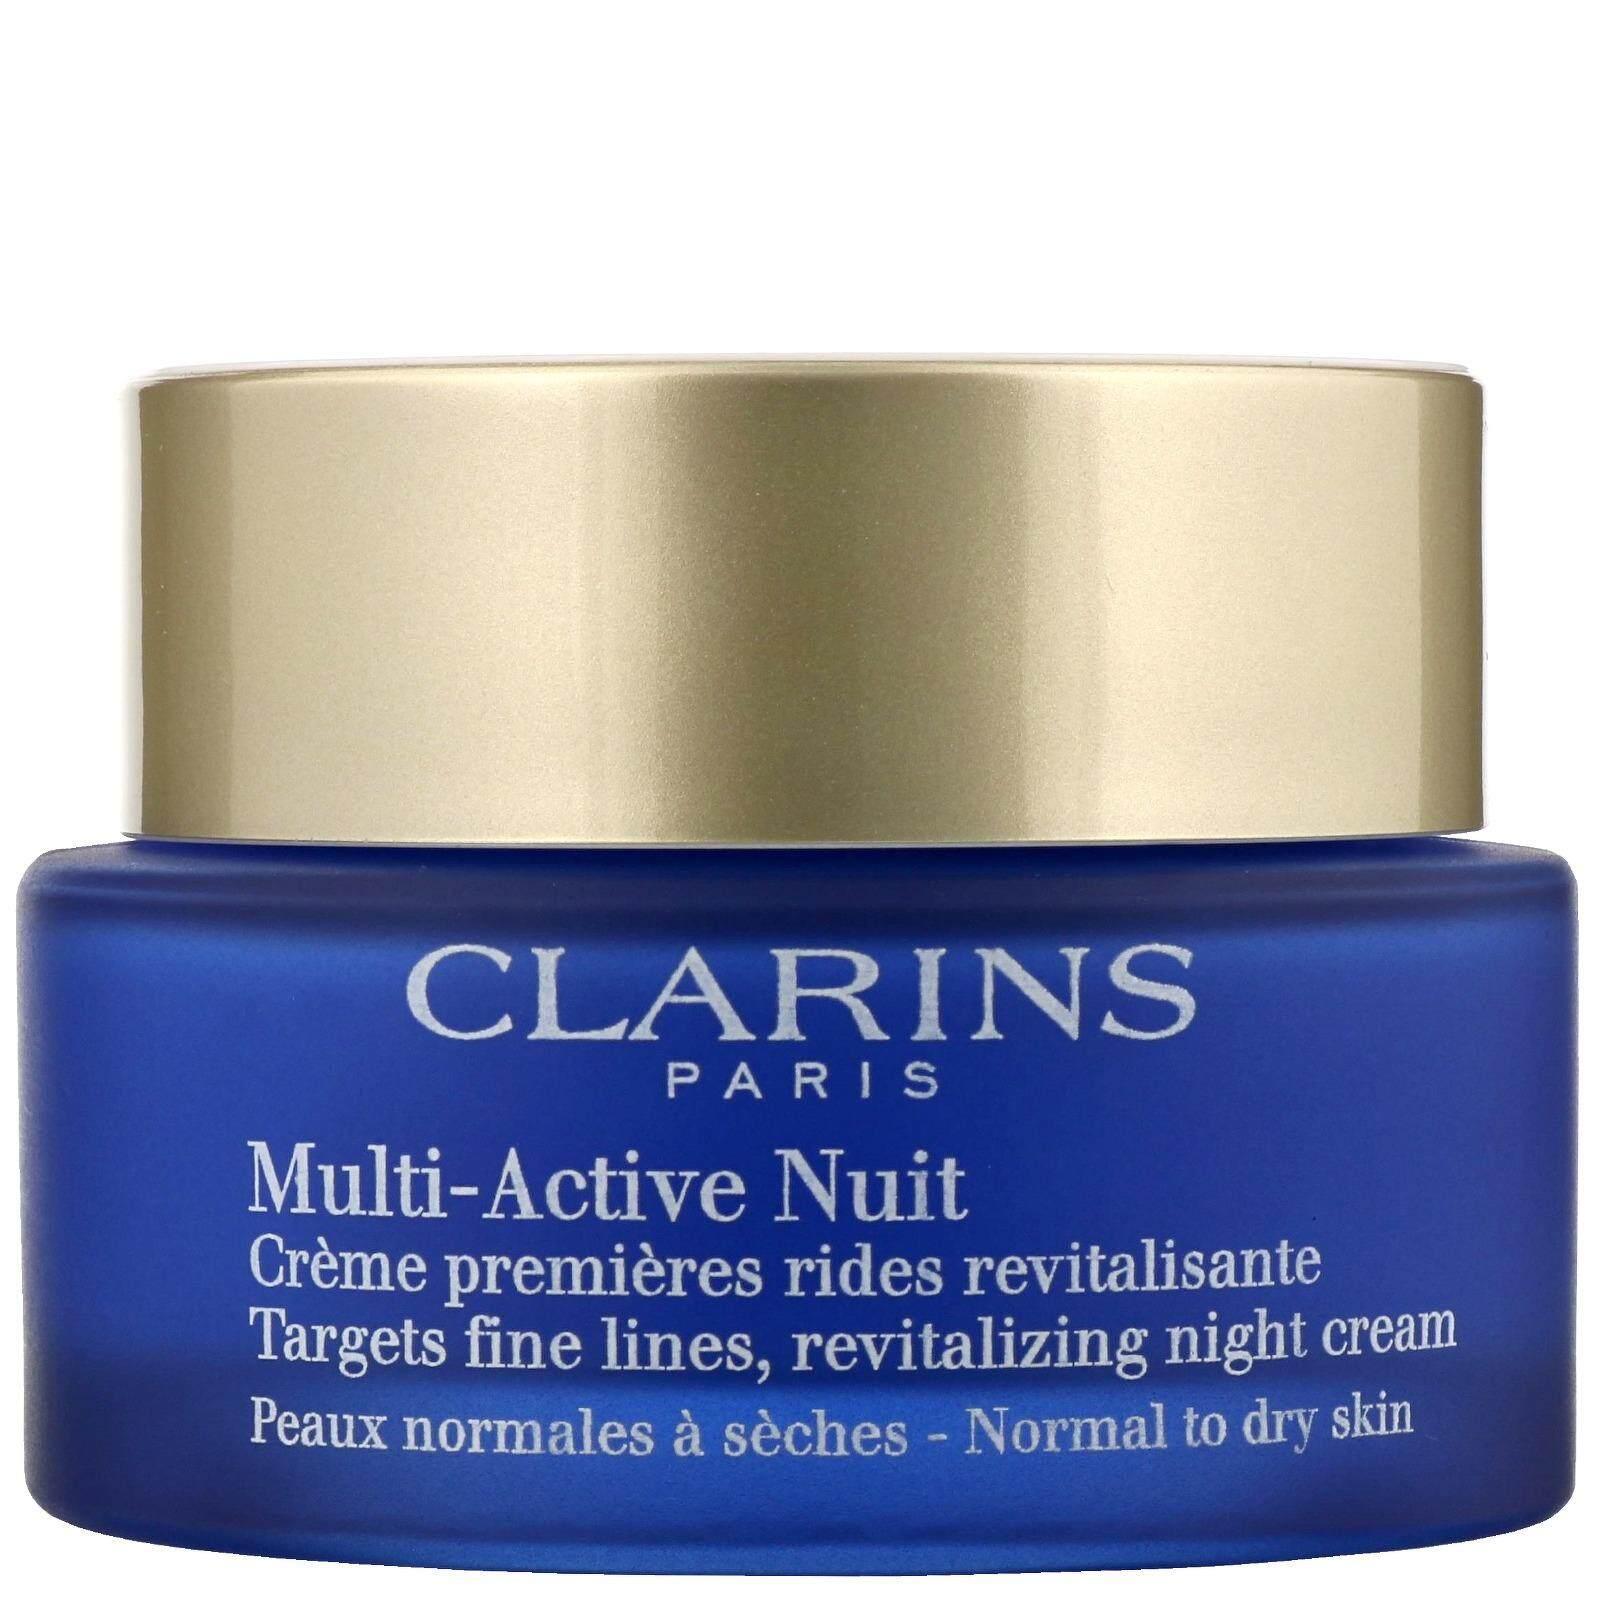 ClarinsMen Line-Control Balm by Clarins #12